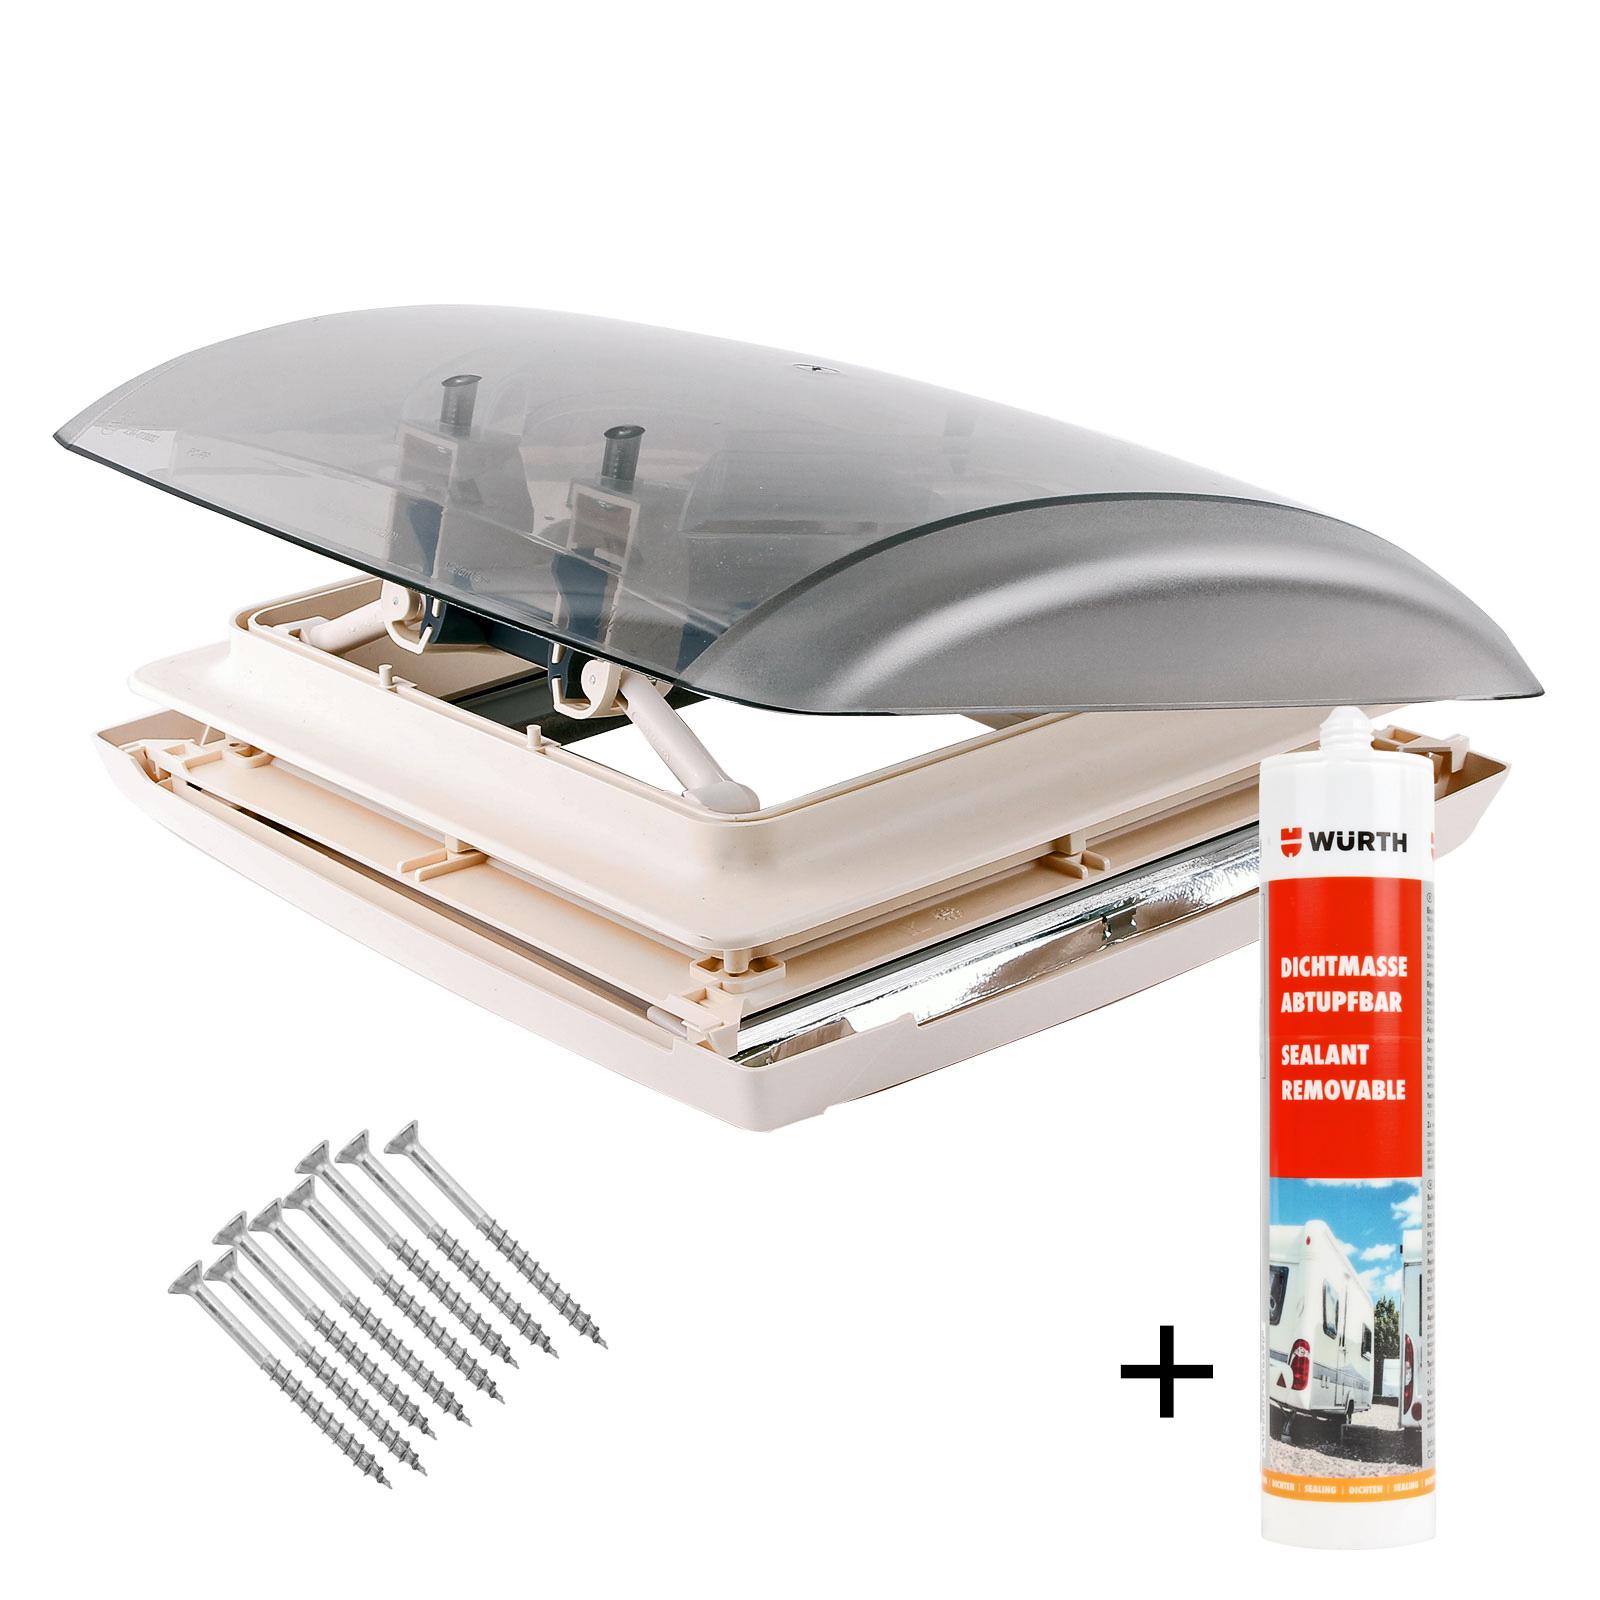 Dachhaube MPK Vision Vent S pro Dachstärke 24-46 mm 27P inkl. Dichtmasse